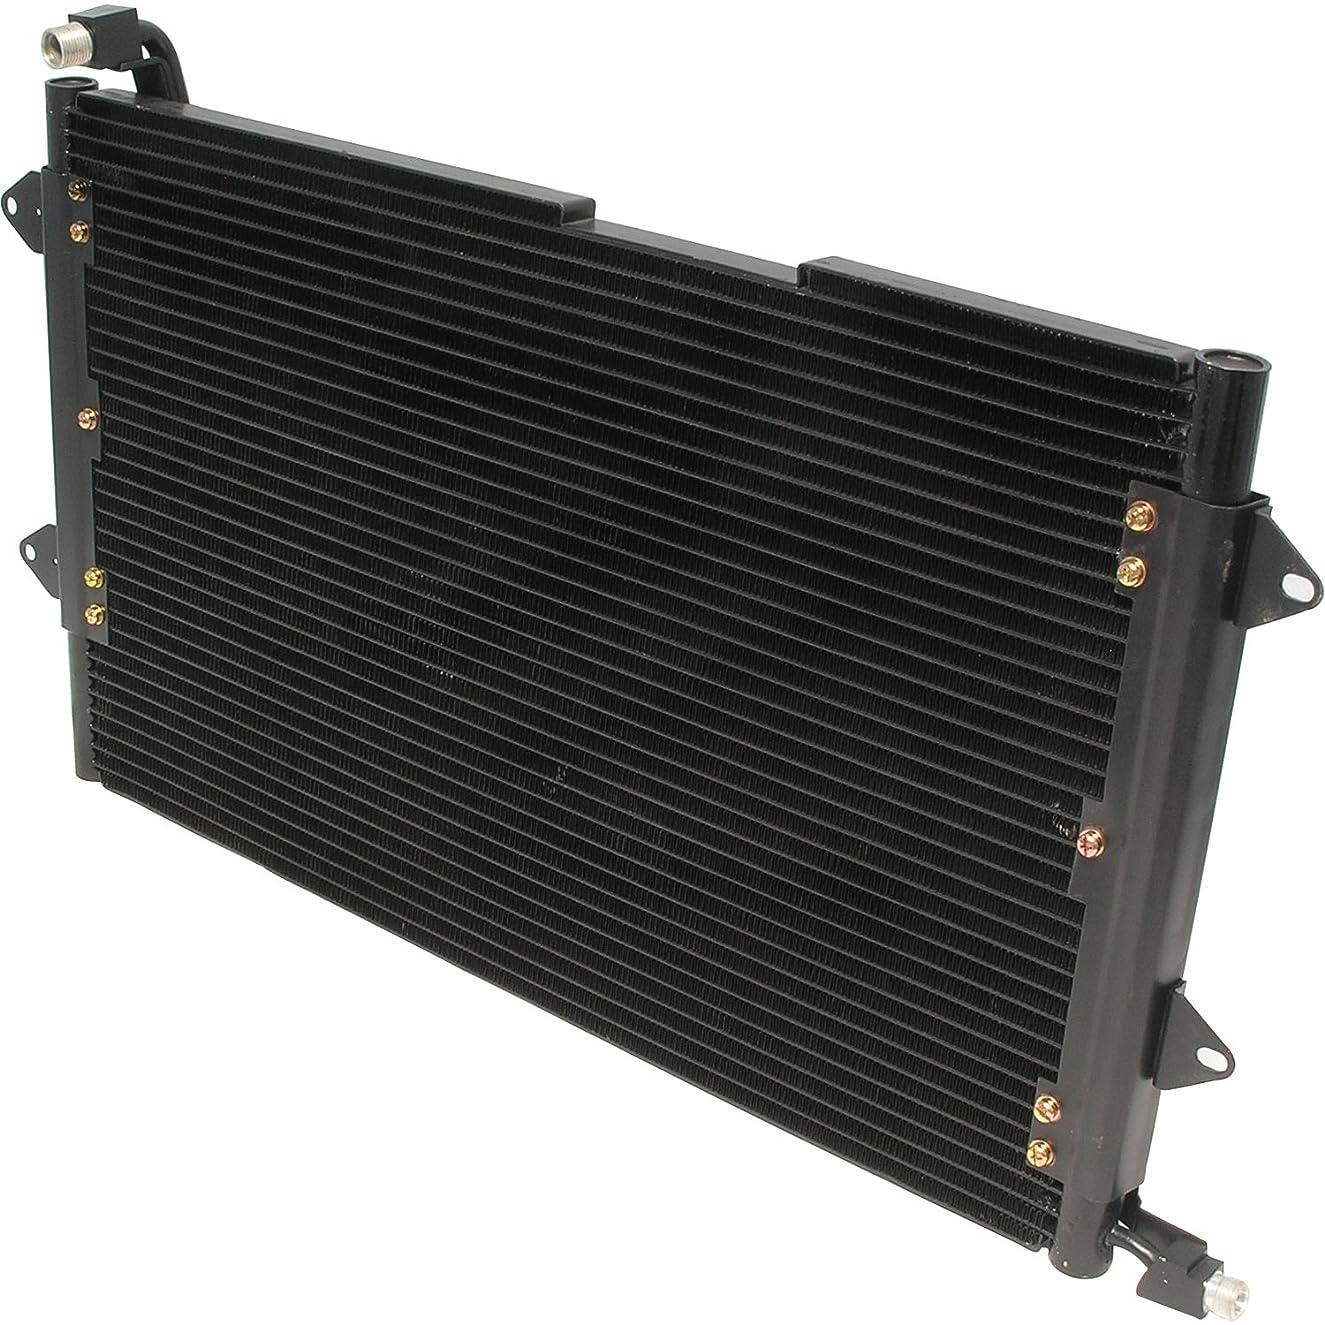 UAC CN 4475PFC A/C Condenser